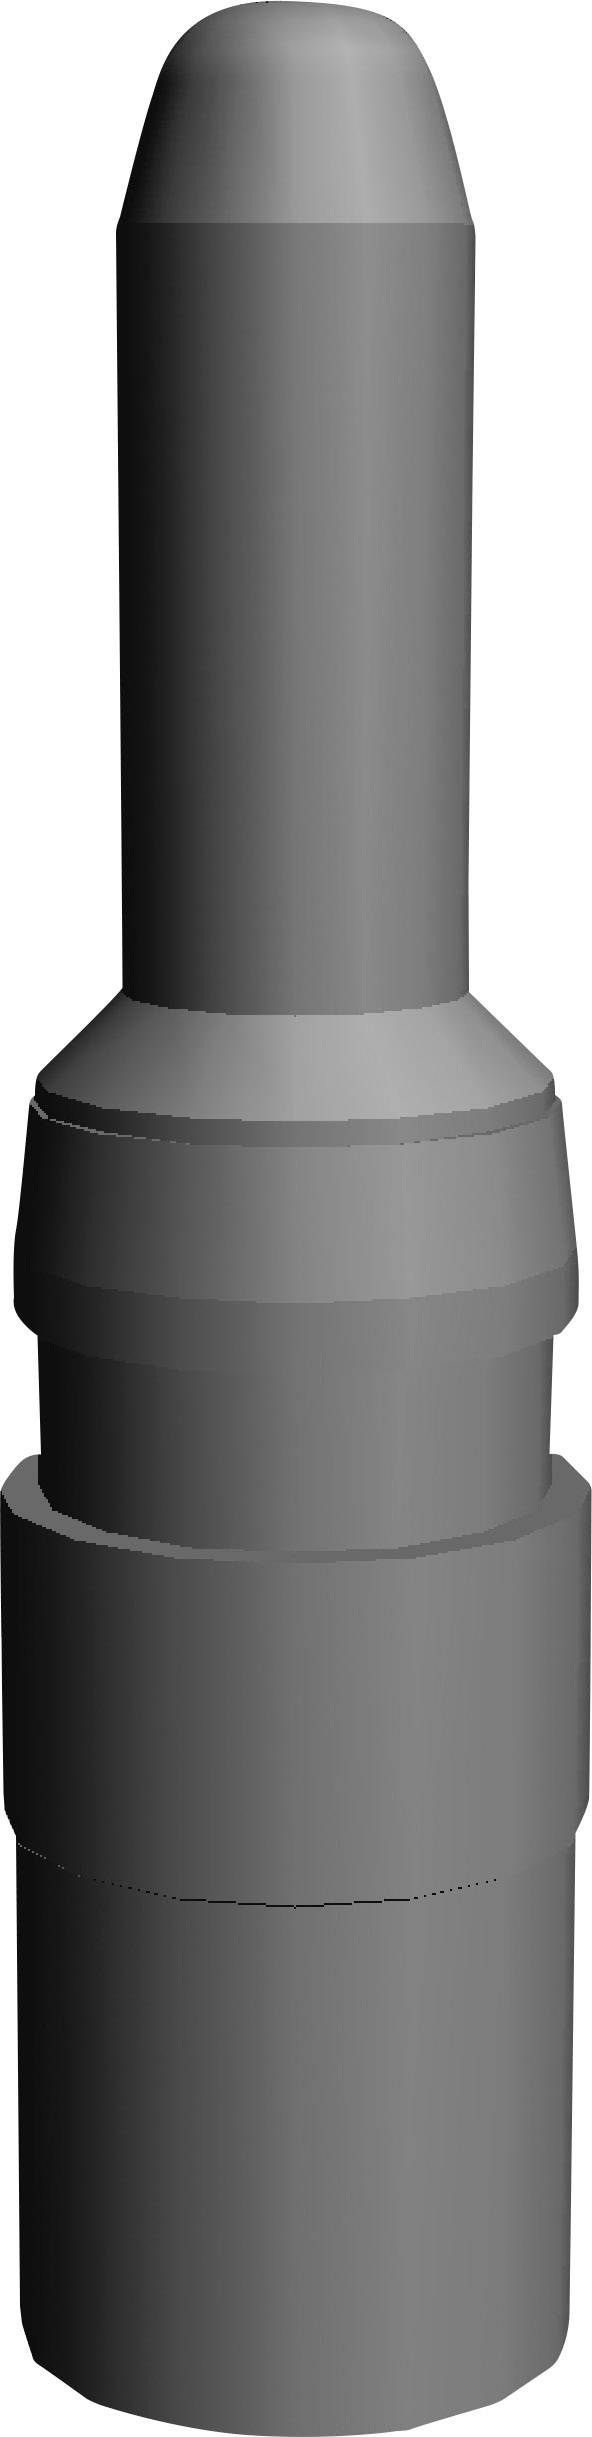 Kolíkový kontakt HSS-C-Sti.Ag.16,0 qmm TE Connectivity, 1 ks